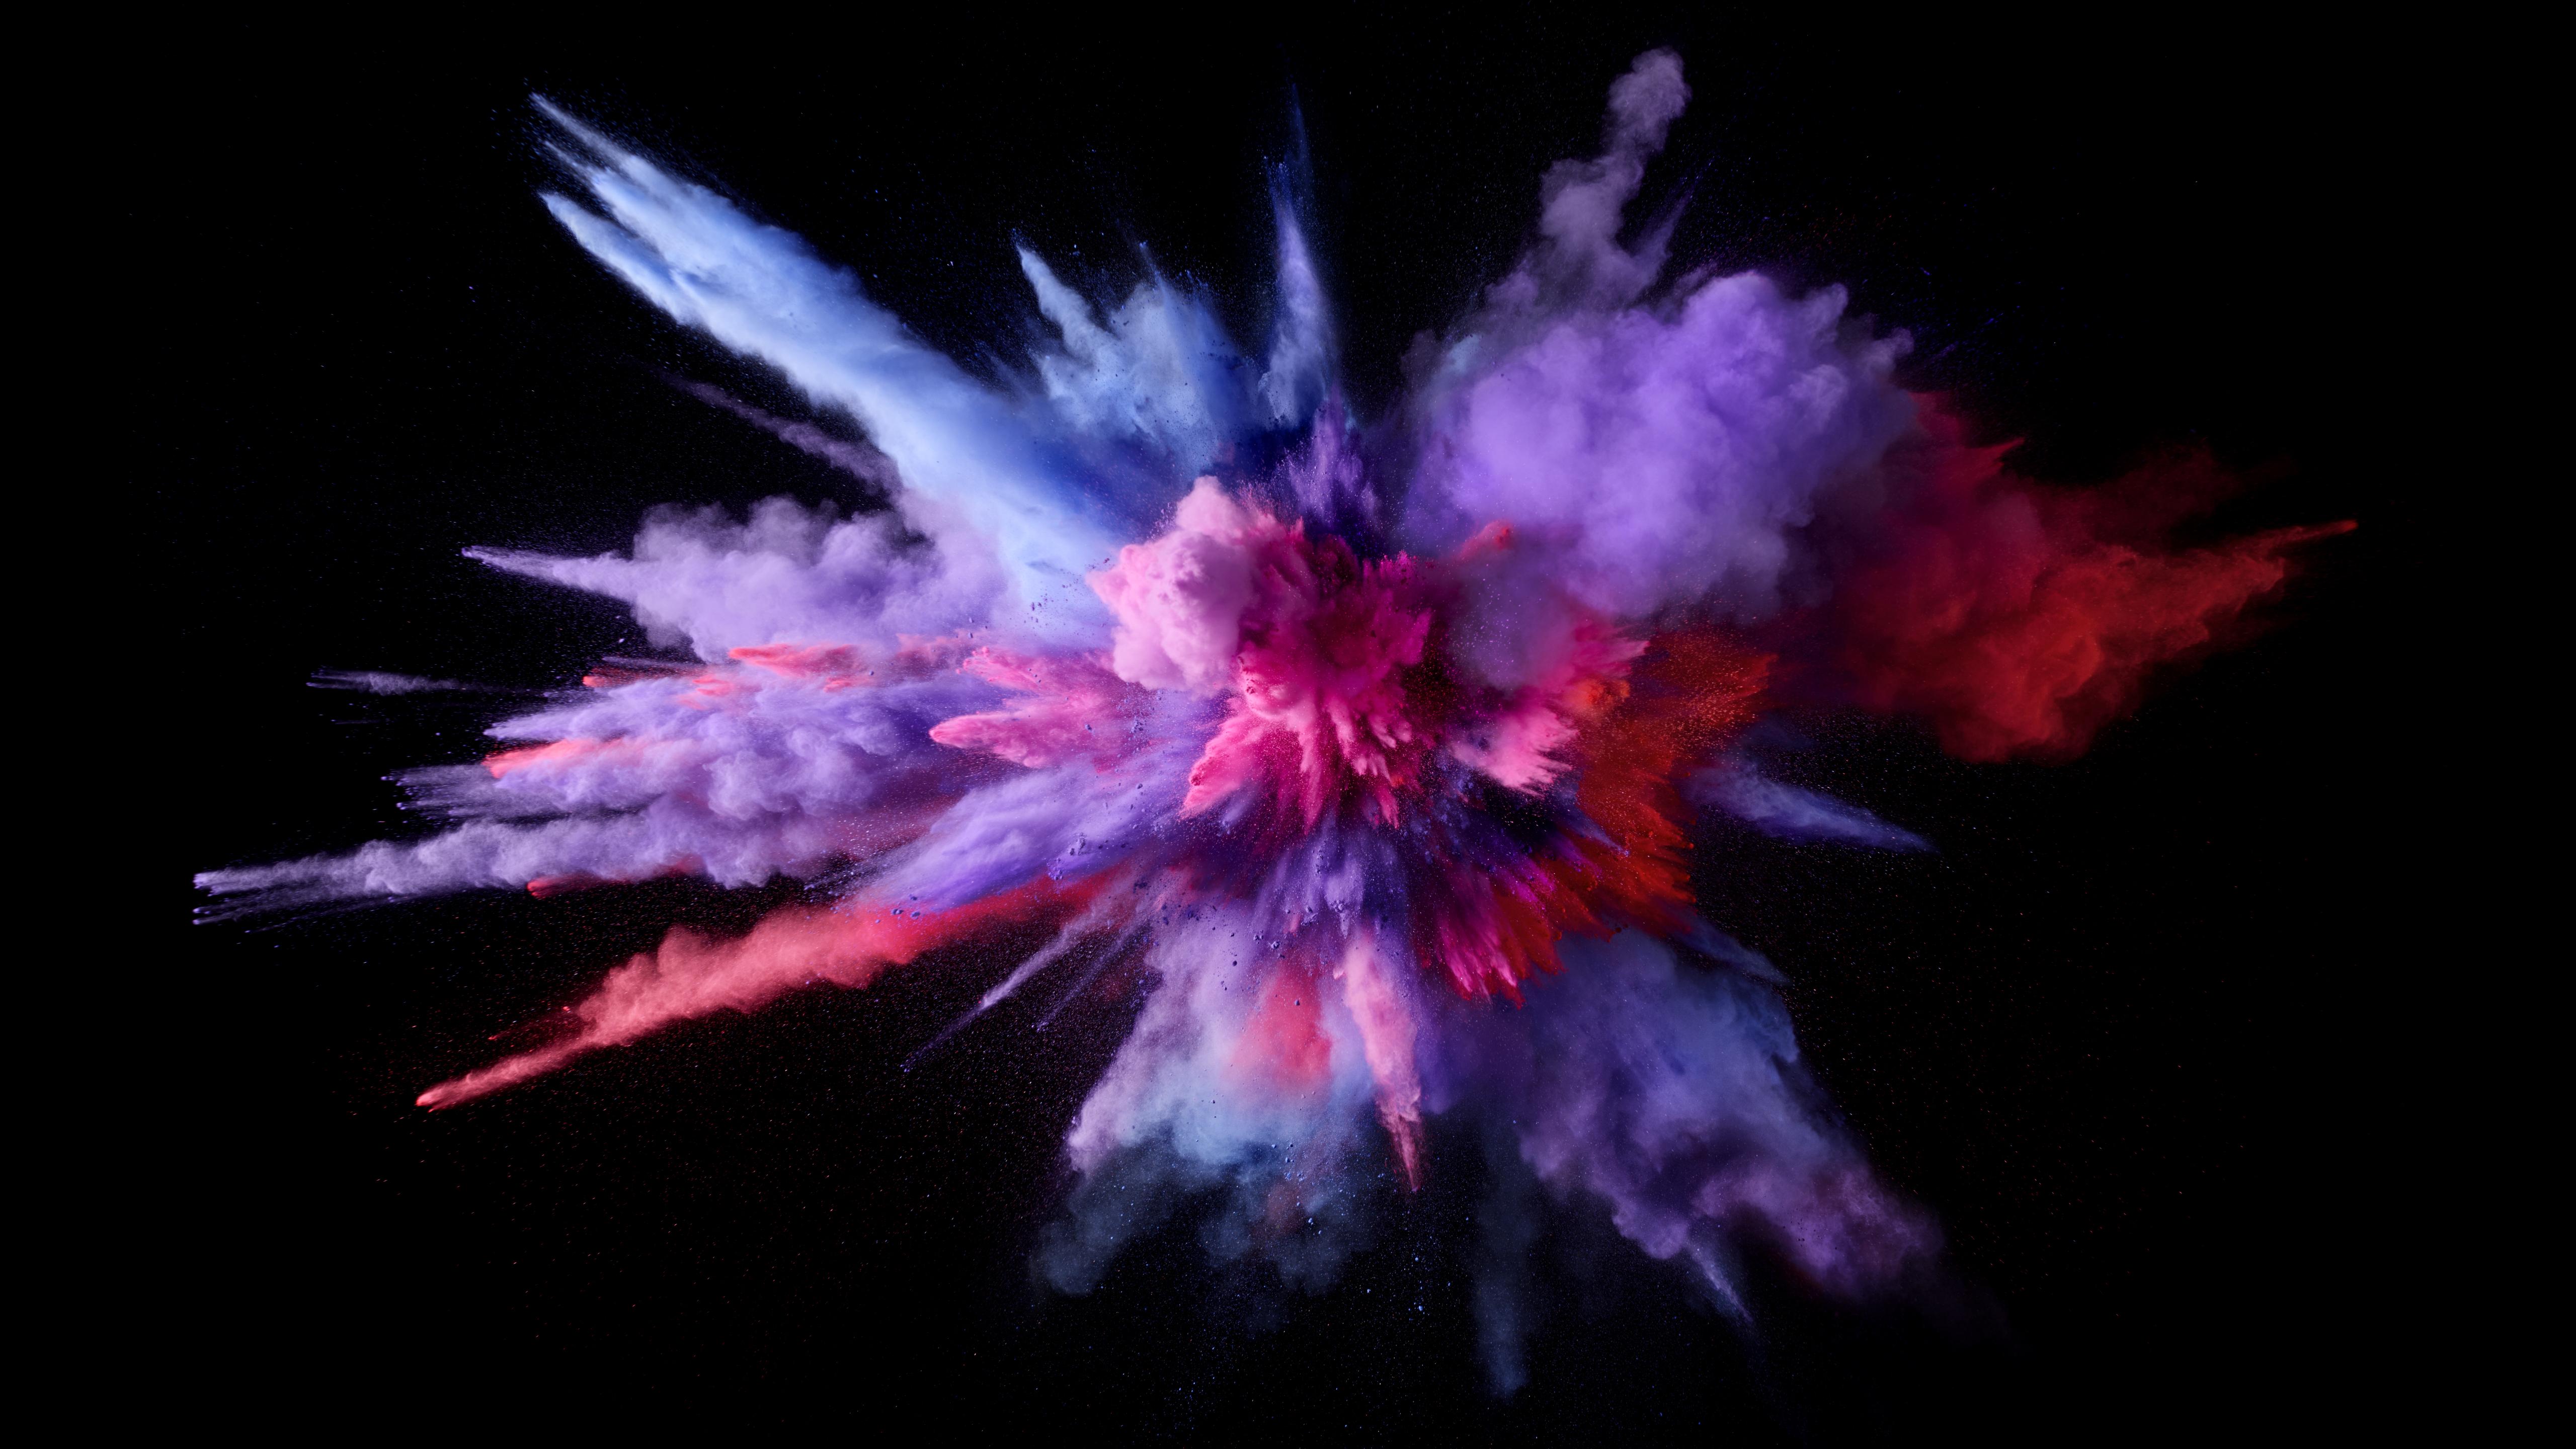 Mac Os Sierra Color Splash Purple Hd Abstract 4k